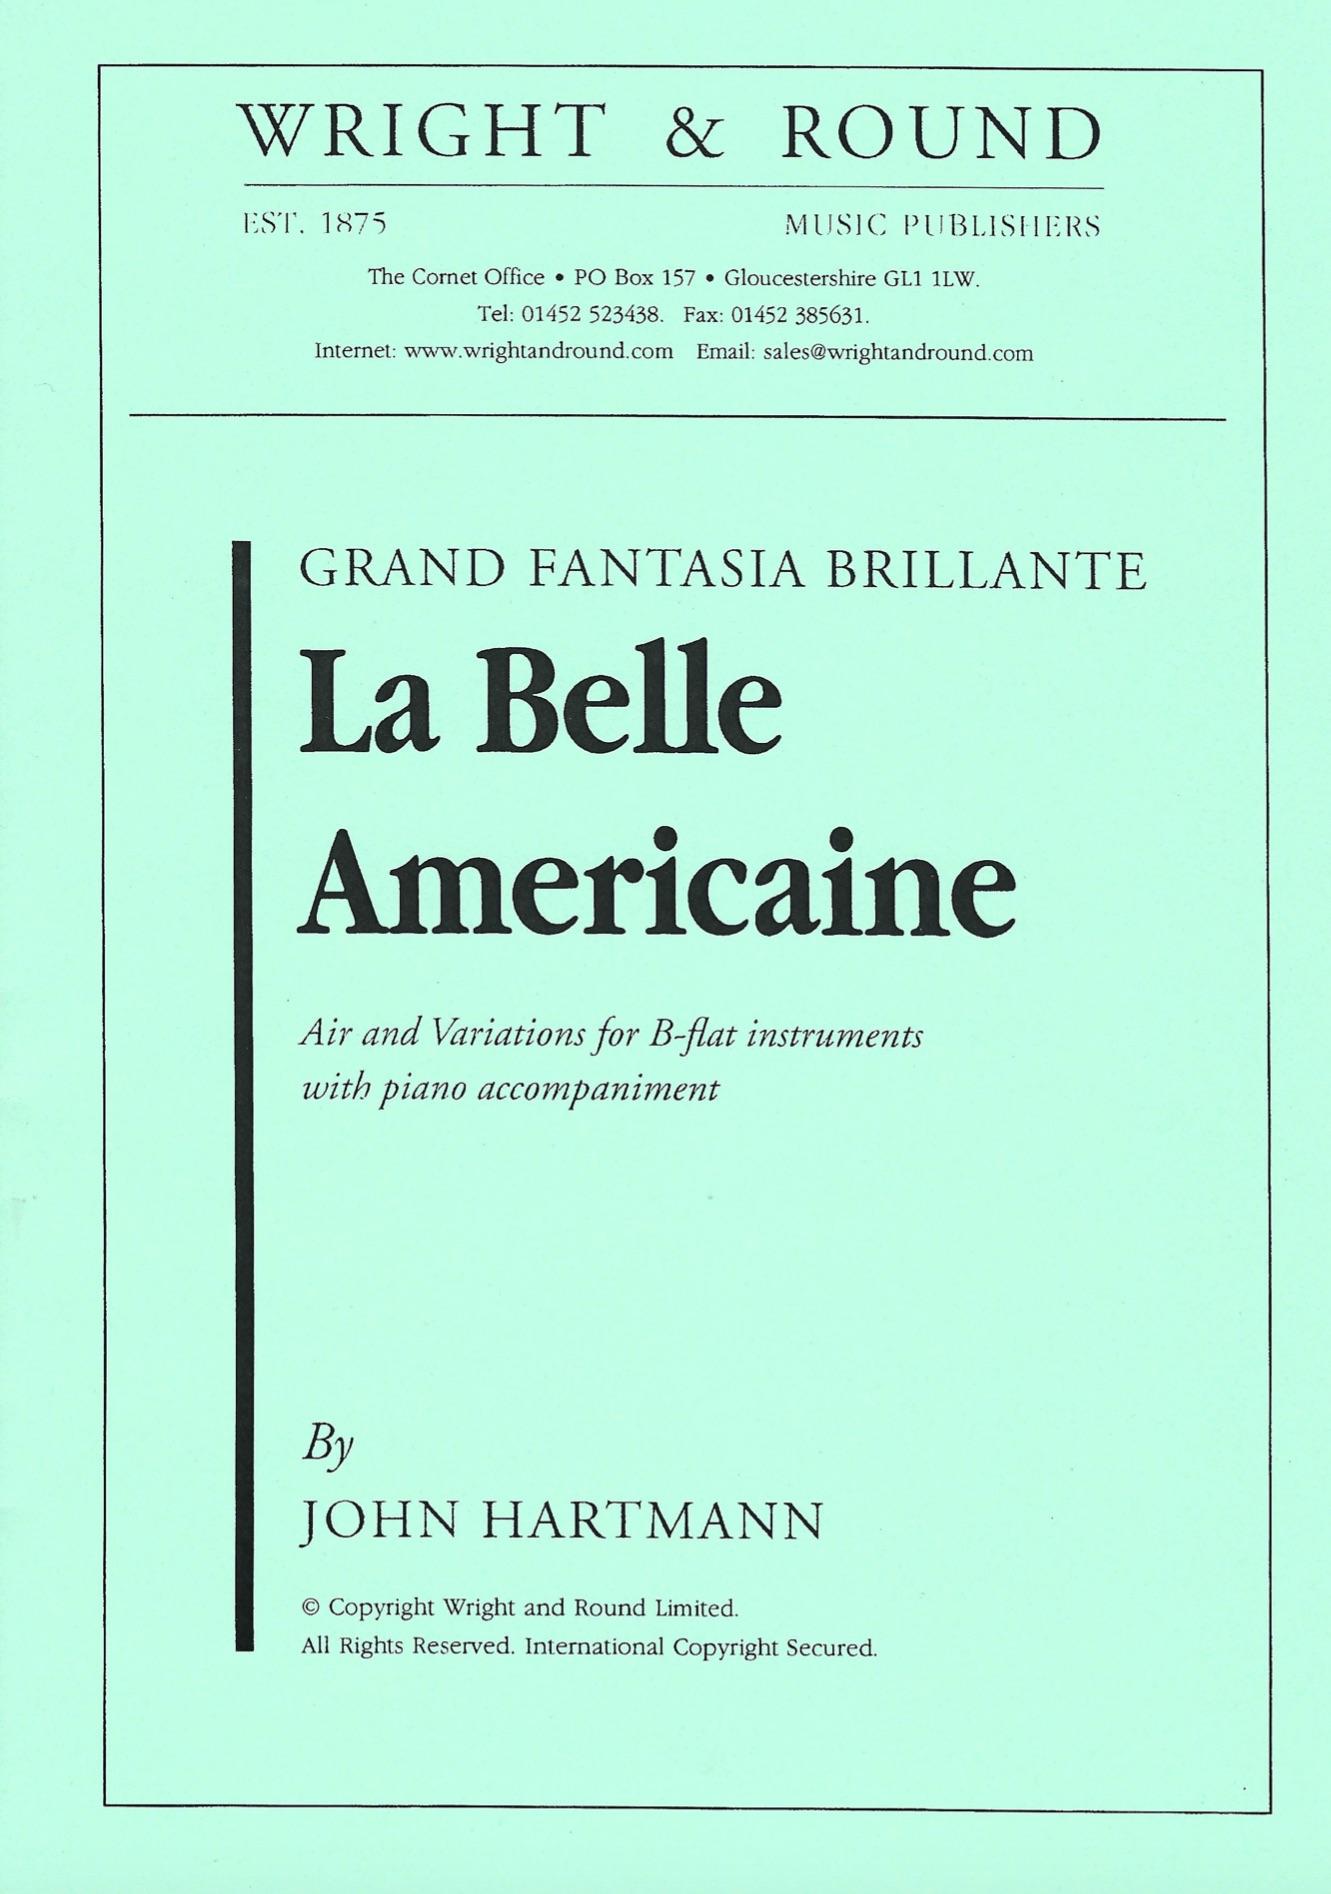 La Belle Americaine - John Hartmann - Euphonium and Piano